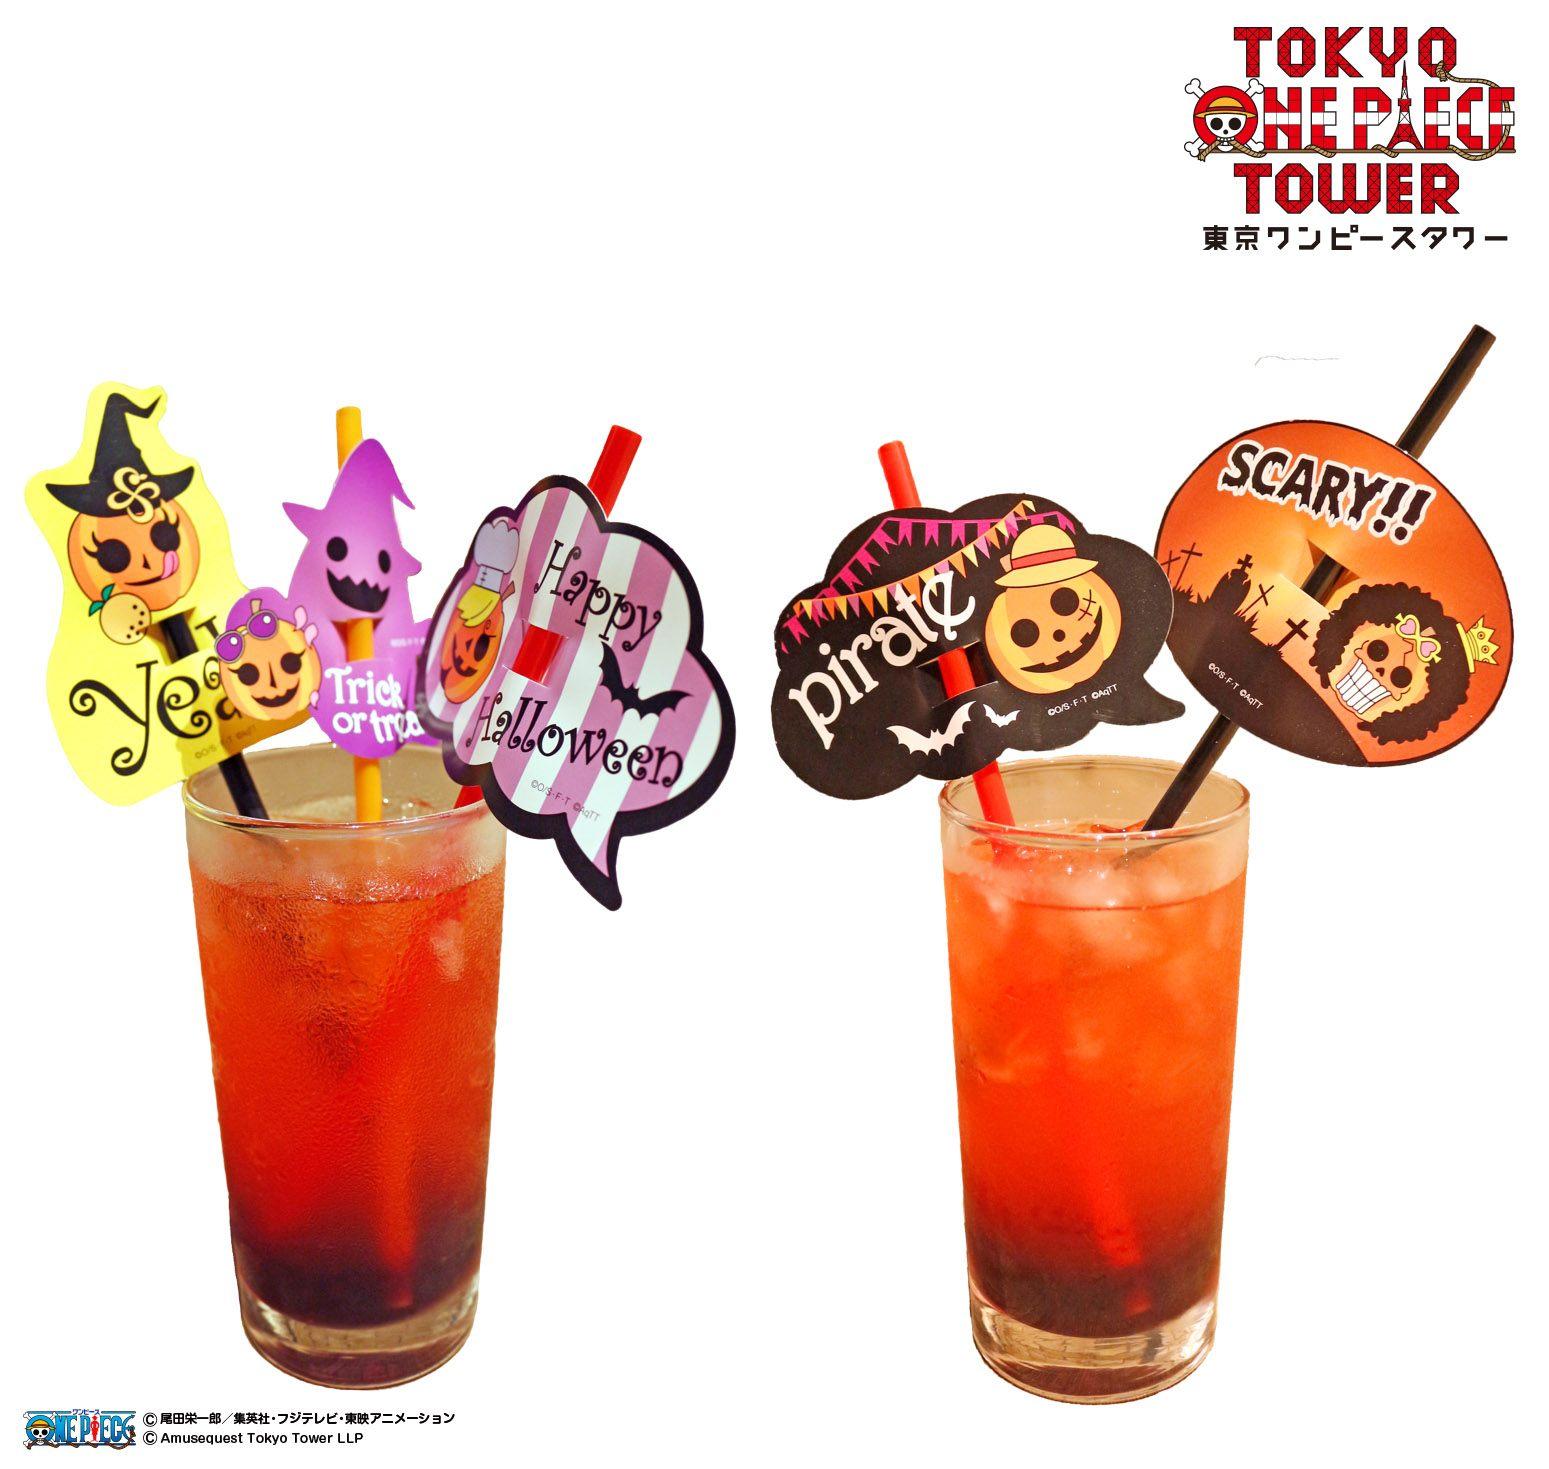 1楼的Cafe Mugiwara有特制的「血液饮料」(700日圆)